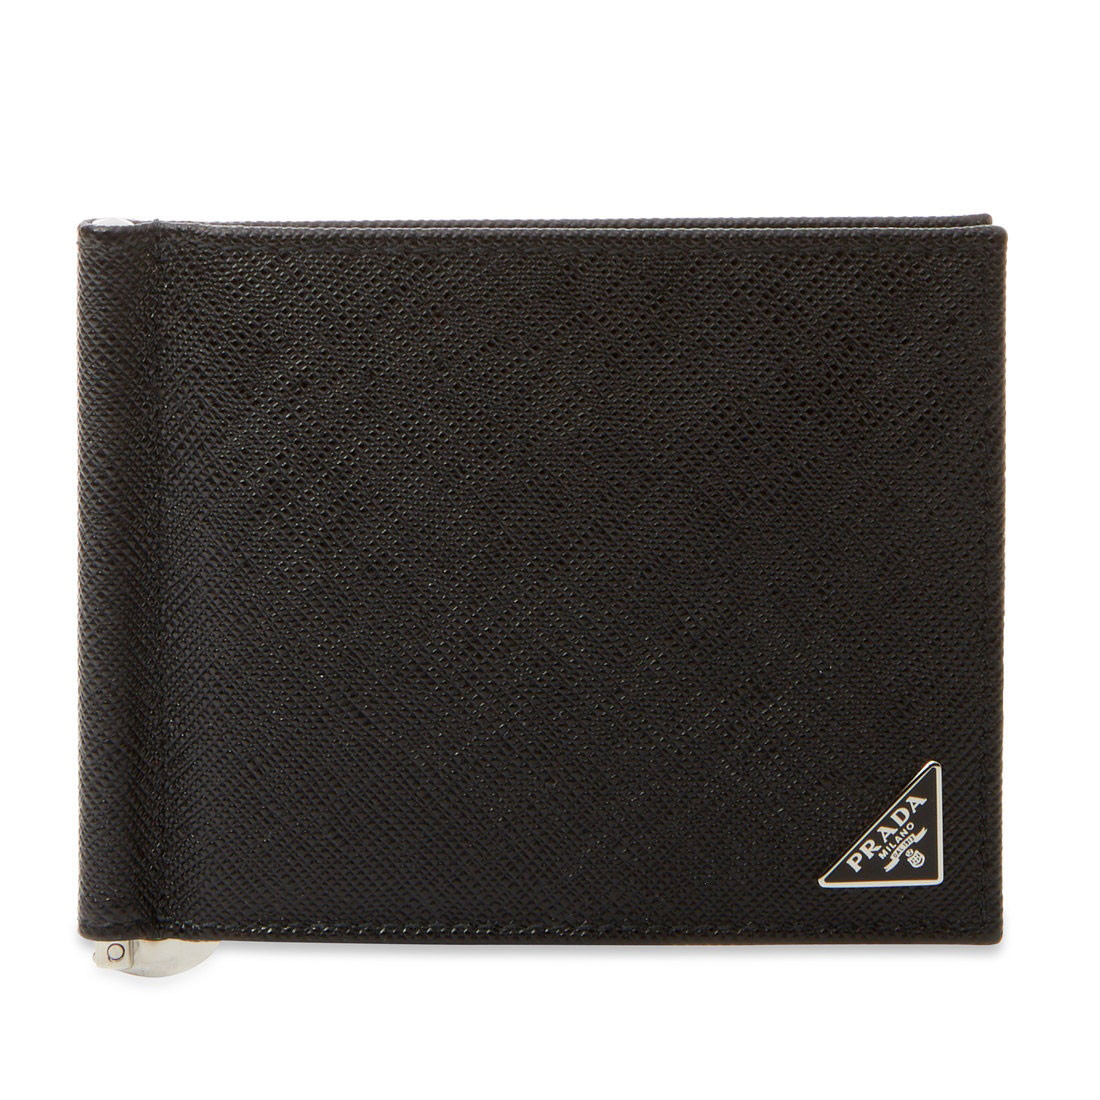 eaaffd4dfde7 ... get prada saffiano leather money clip billfold wallet af595 9464f